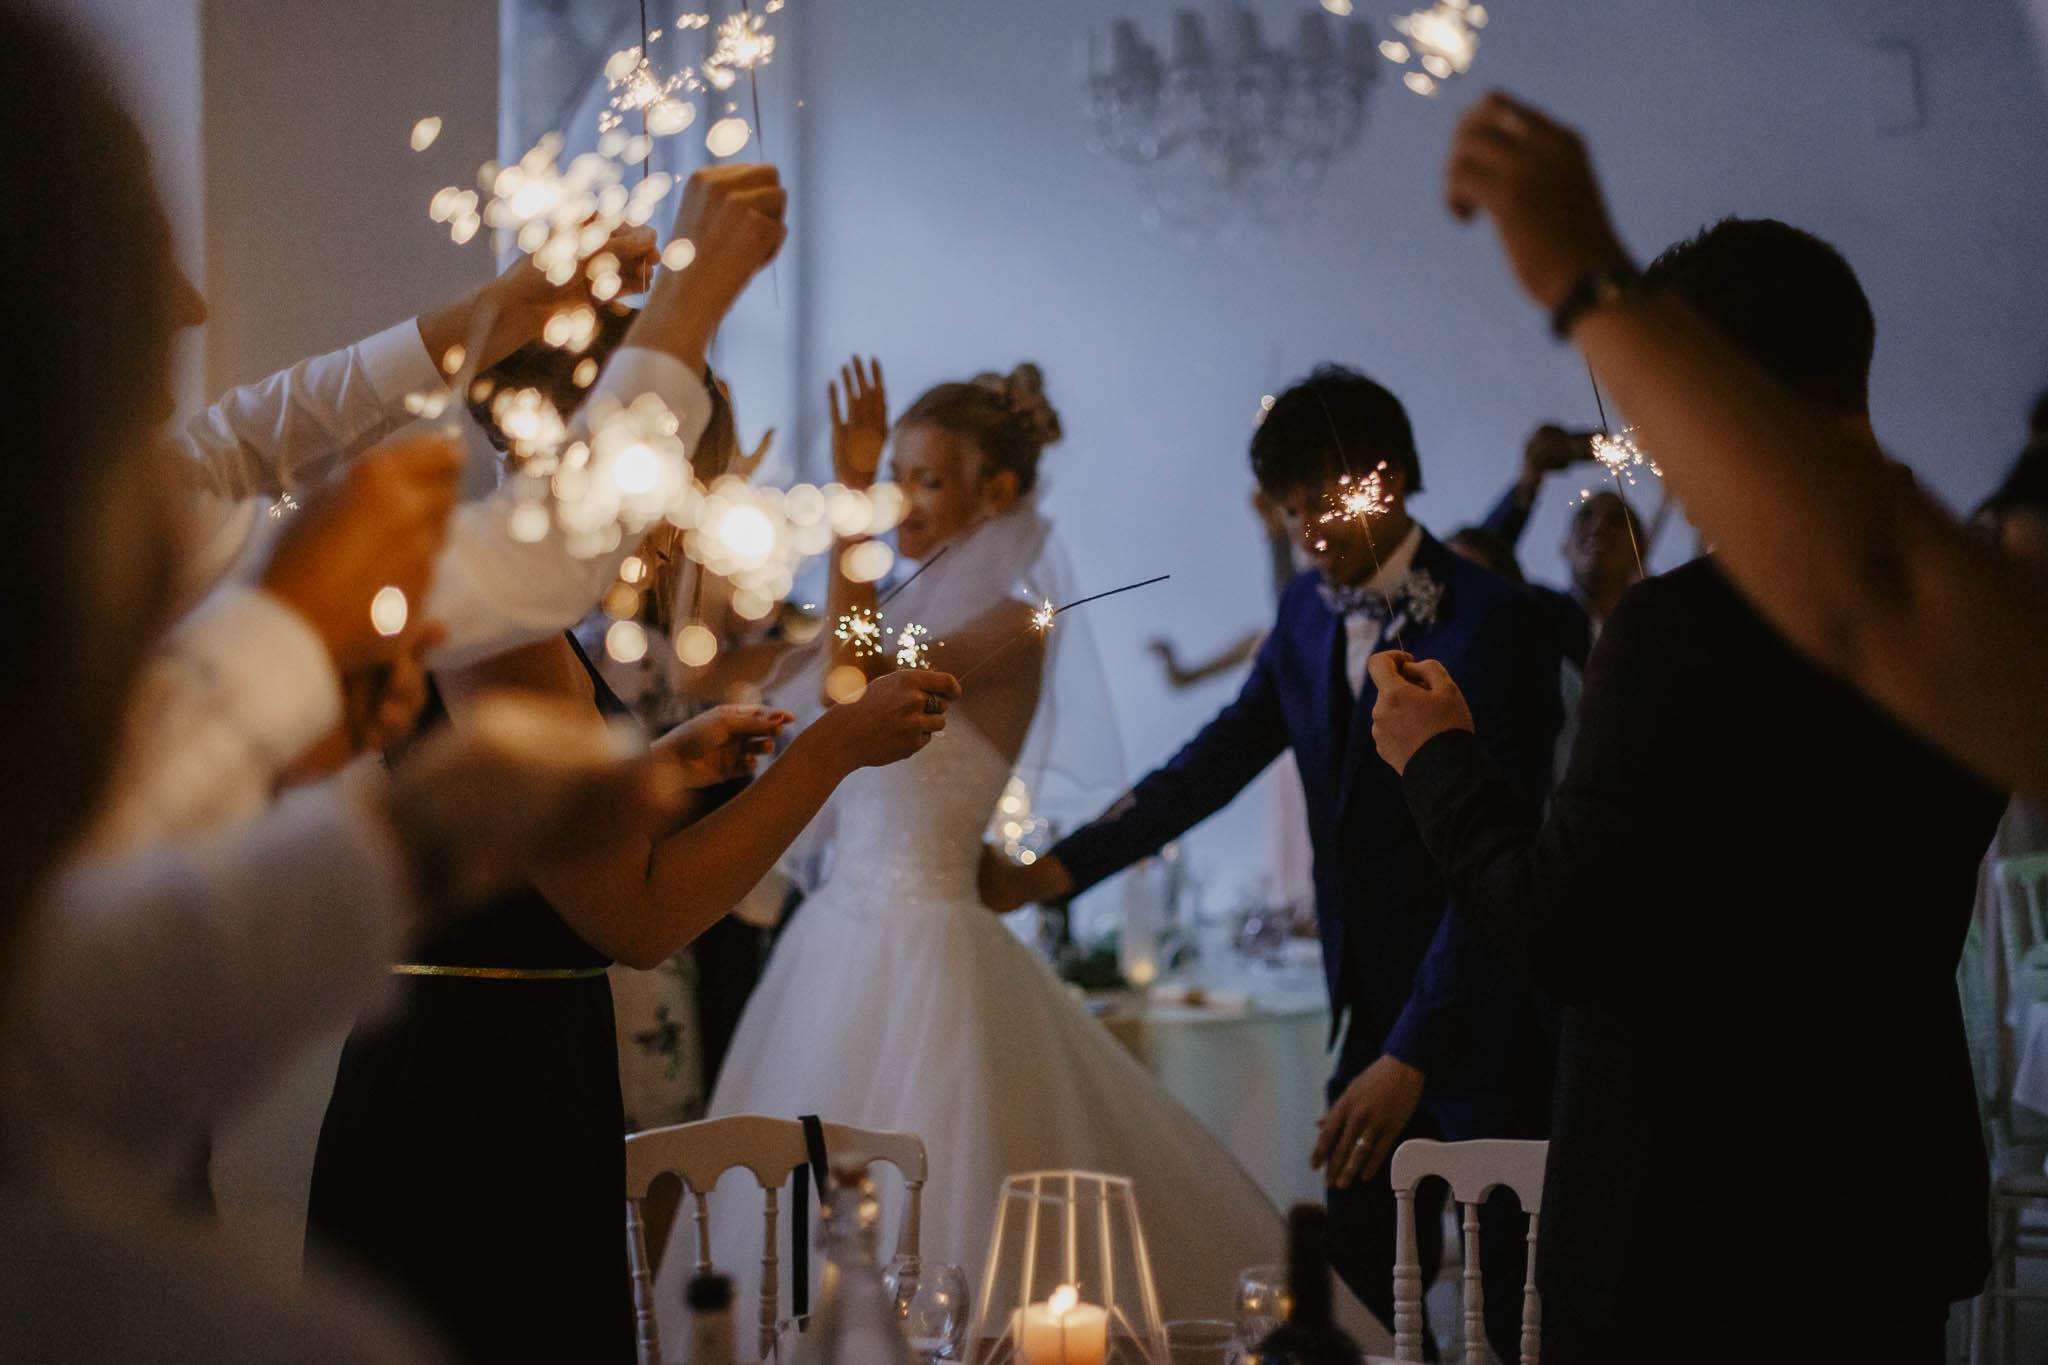 mariage-chateau-gaudras-ingold-94.jpg